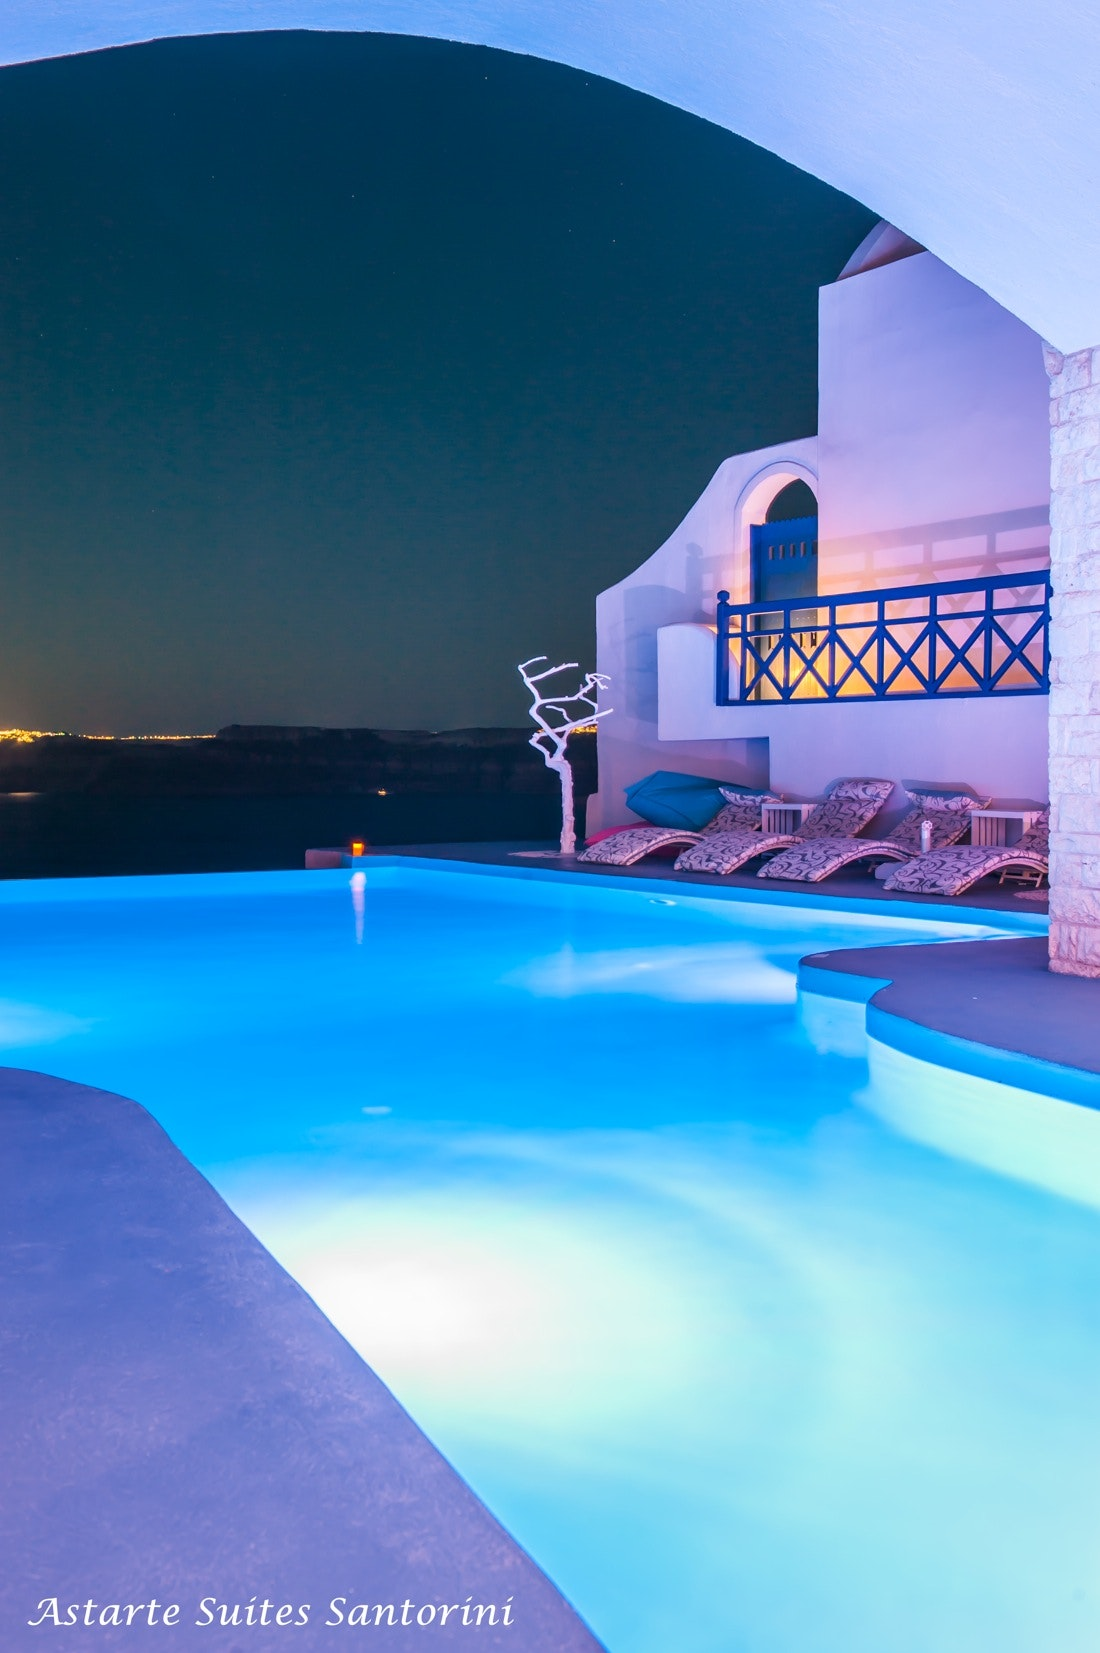 Archinect & Astarte Suites Hotel Santorini Greece | A\u0026J | Archinect